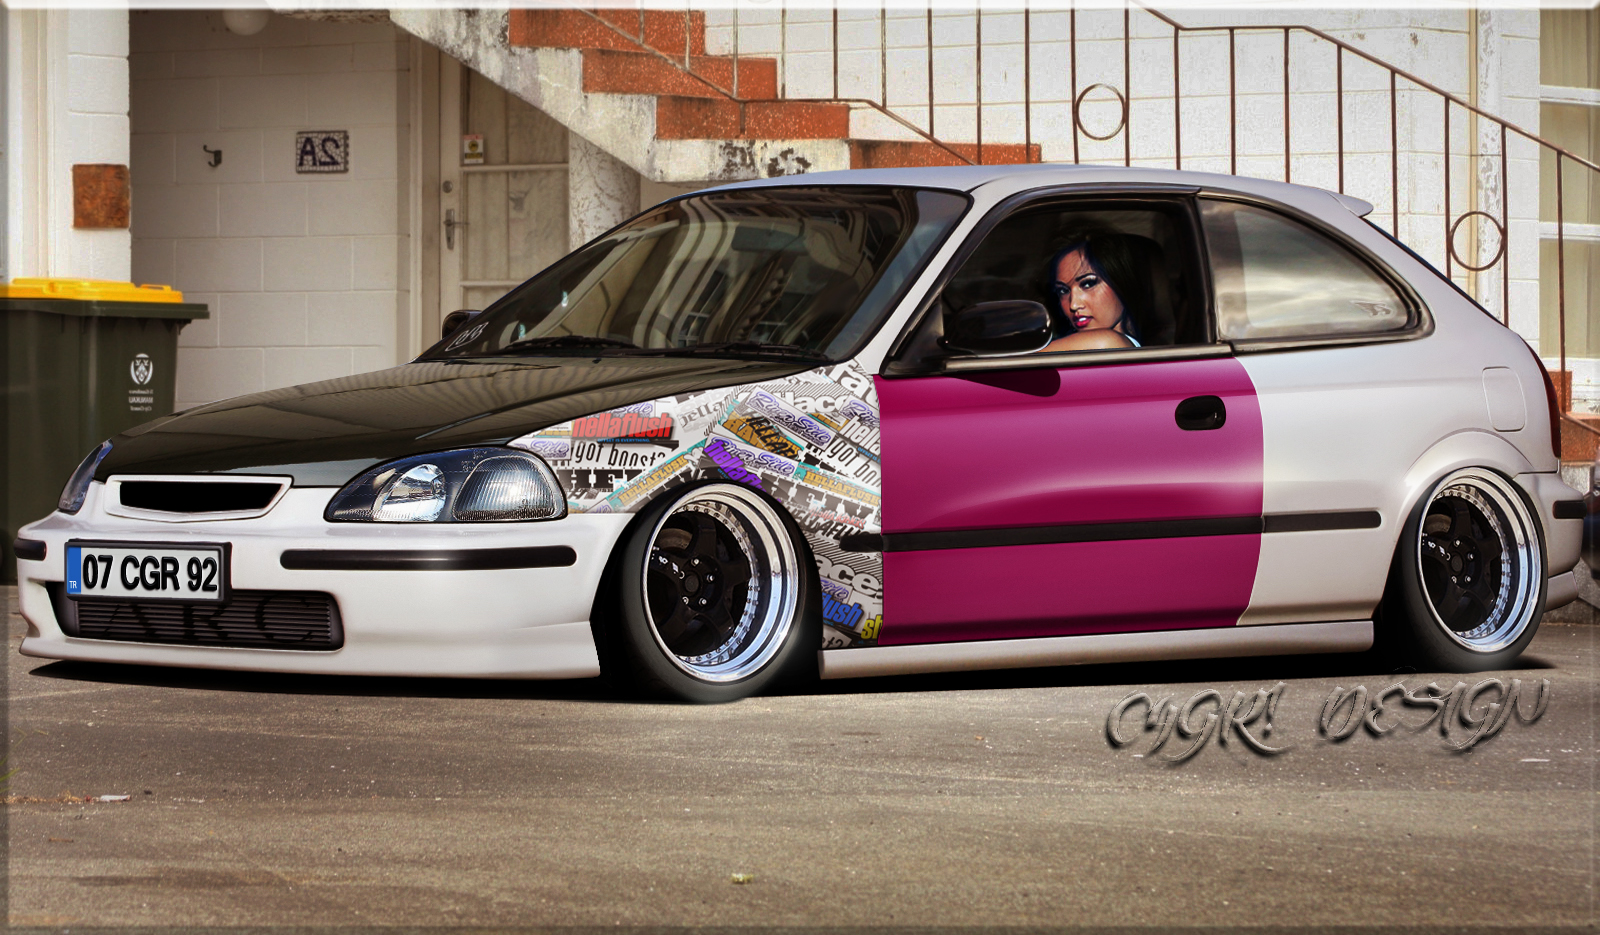 hellaflush wallpaper car - photo #9